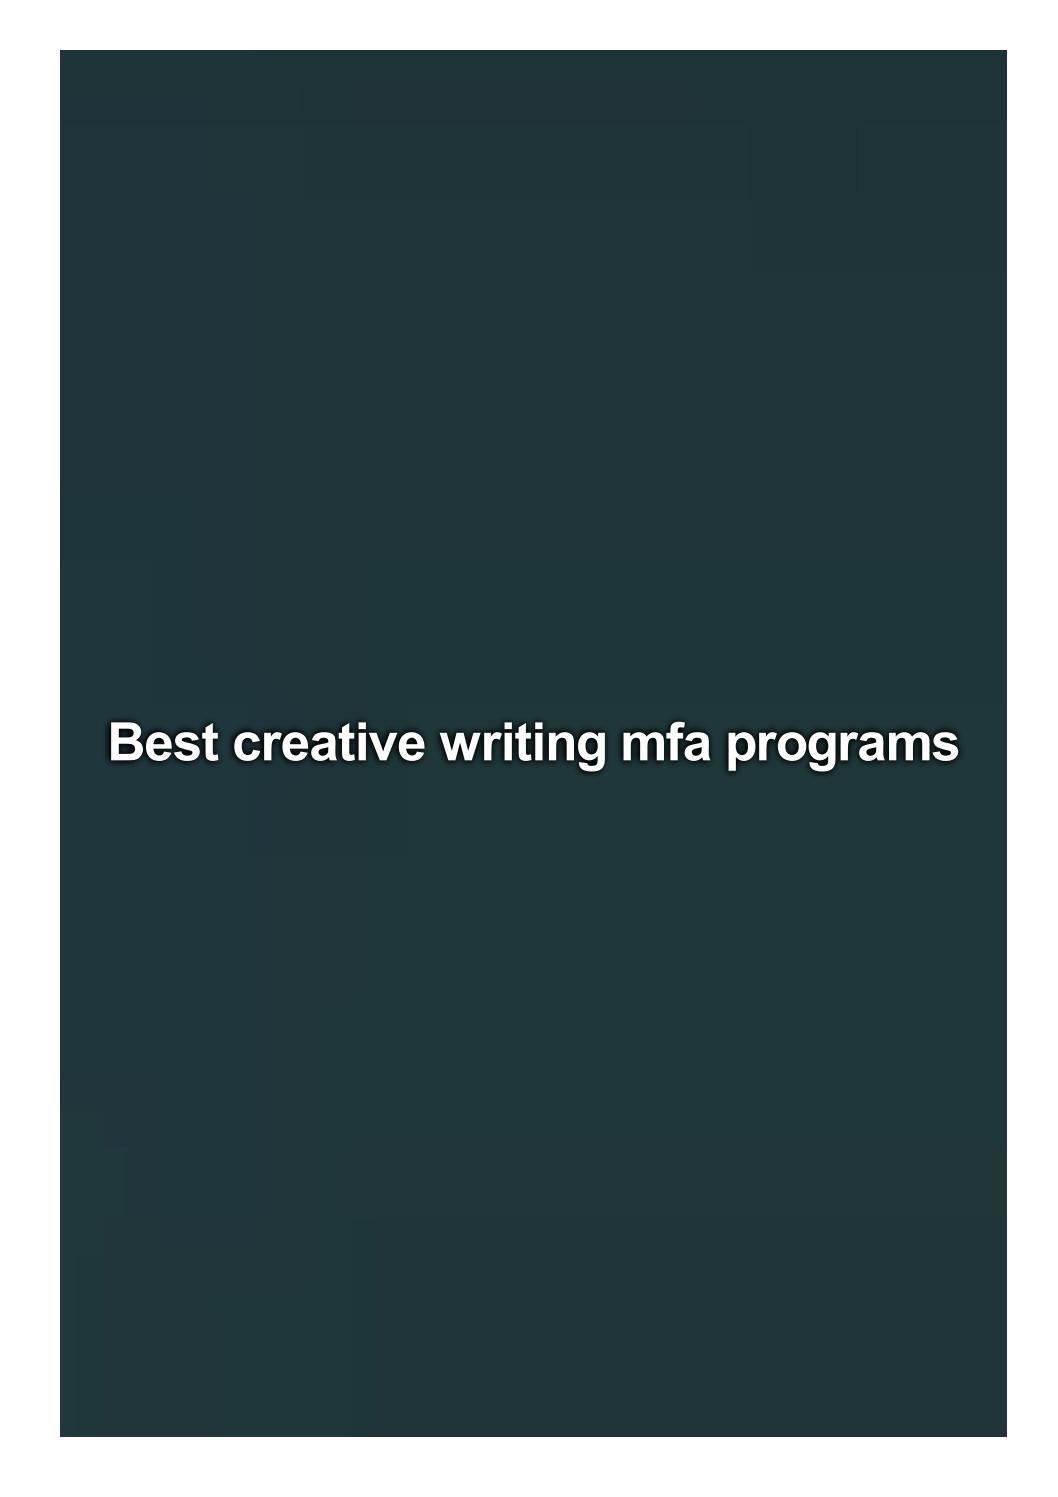 Best creative writing mfa essay writing on my favourite teacher